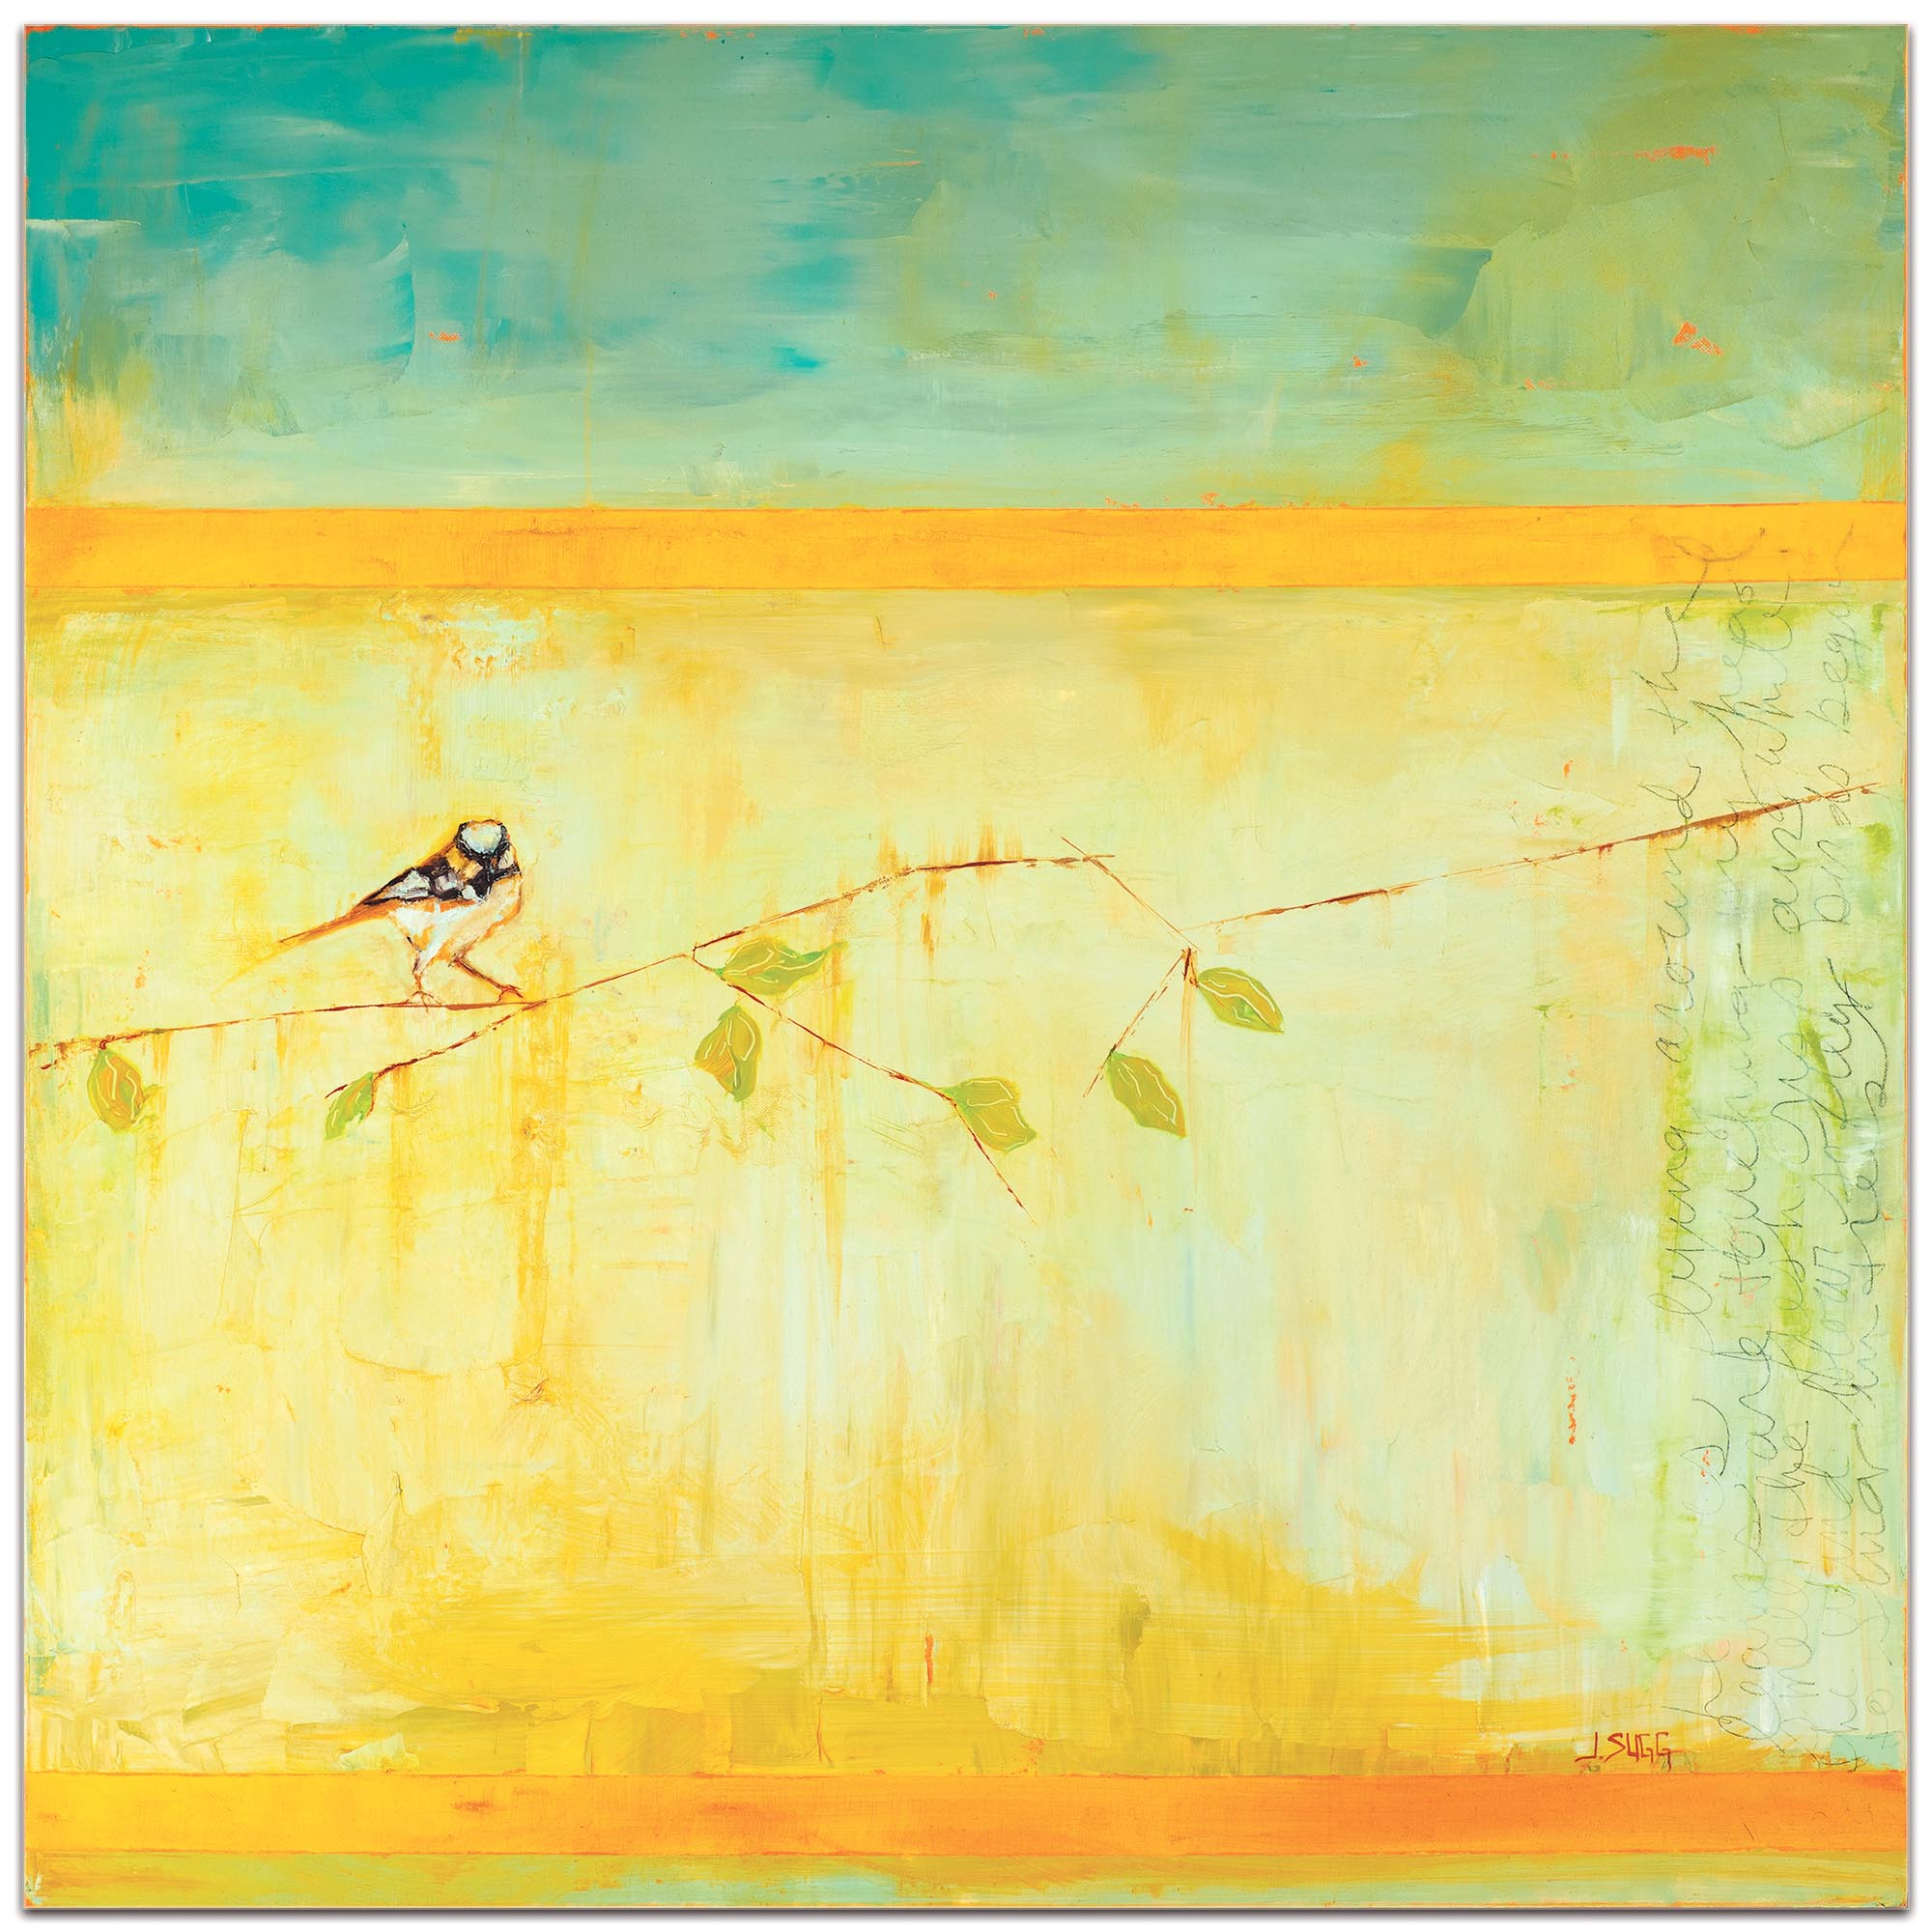 Contemporary Wall Art 'Bird with Horizontal Stripes' - Urban Birds Decor on Metal or Plexiglass - Image 2